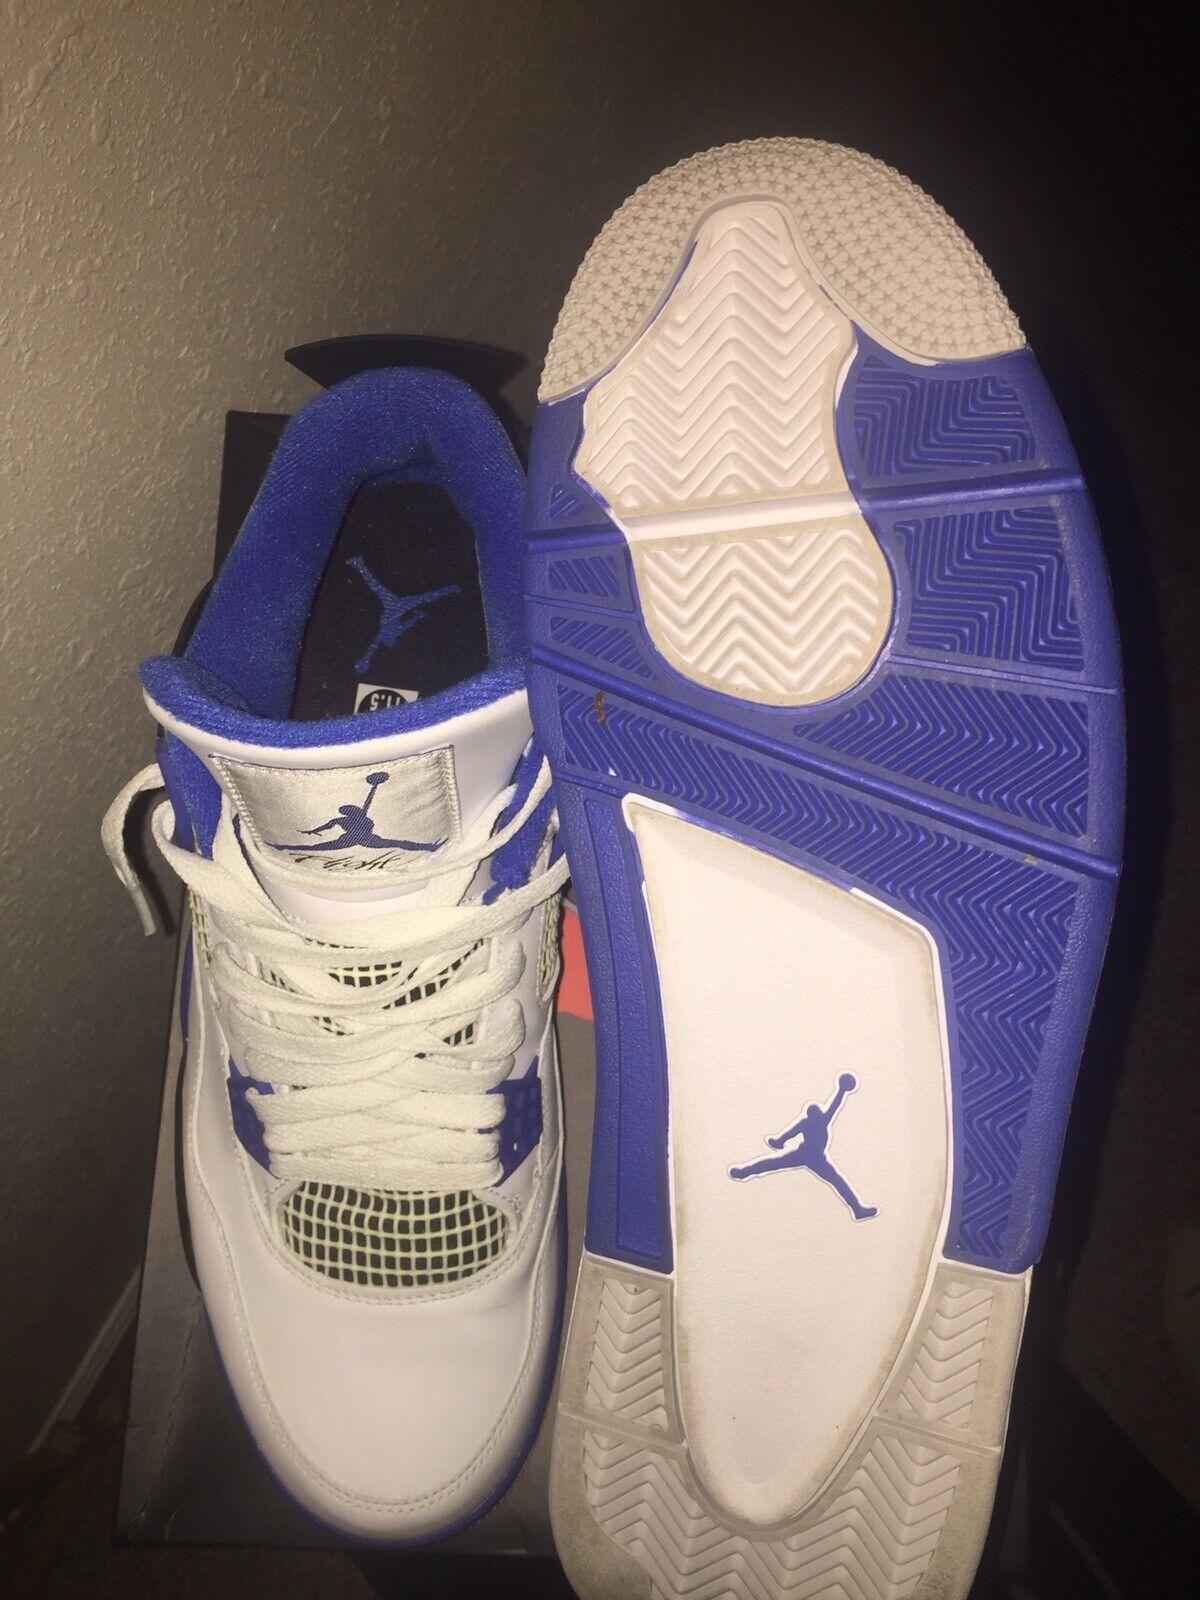 Air Jordan 4 Retro  Military bluee  Mens Size 11.5   GREAT CONDITION